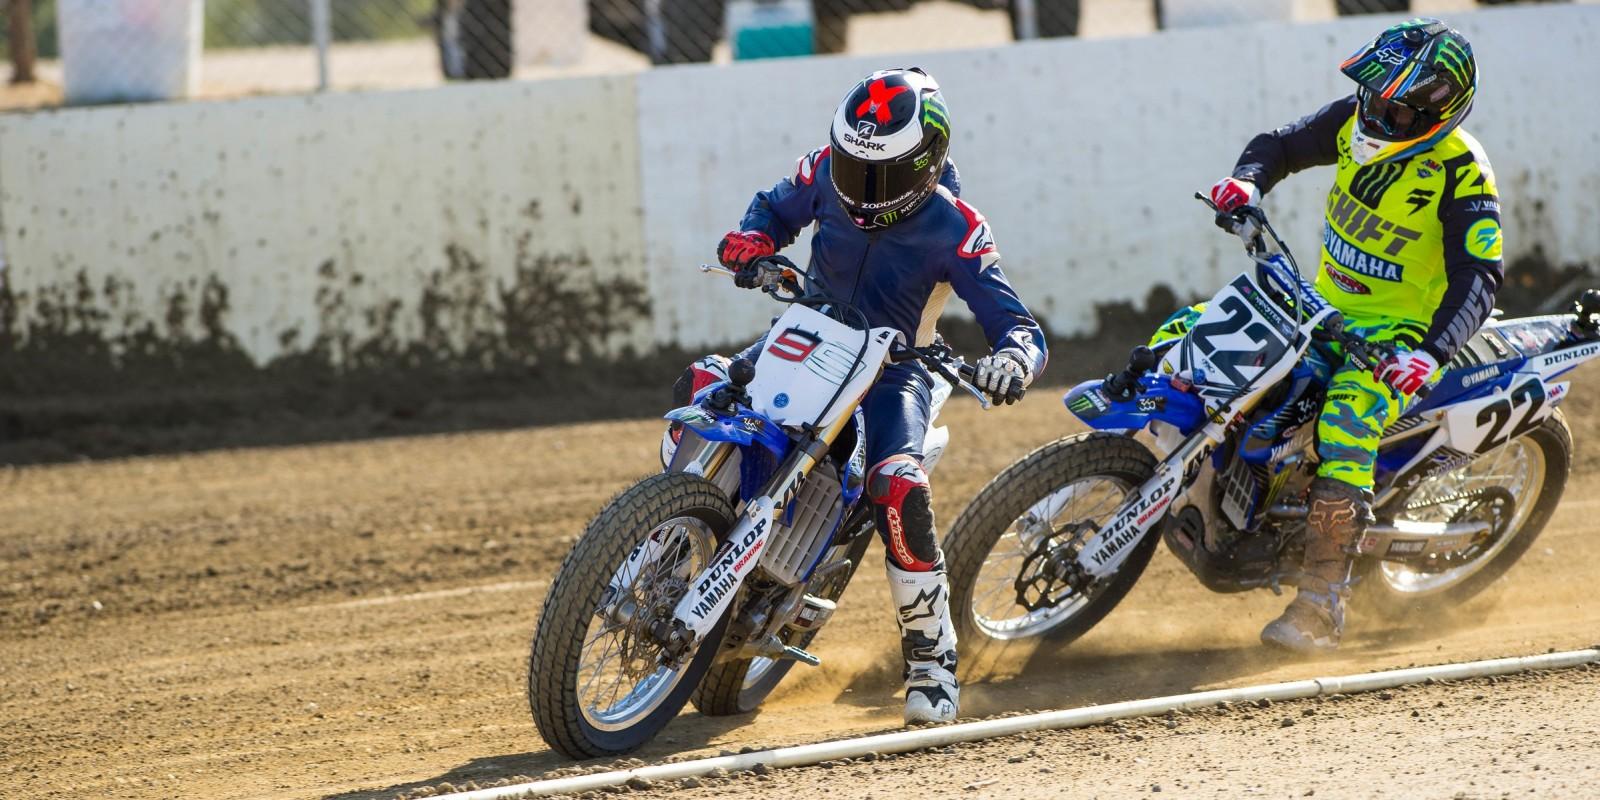 Jorge Lorenzo and Chad Reed race flat track.